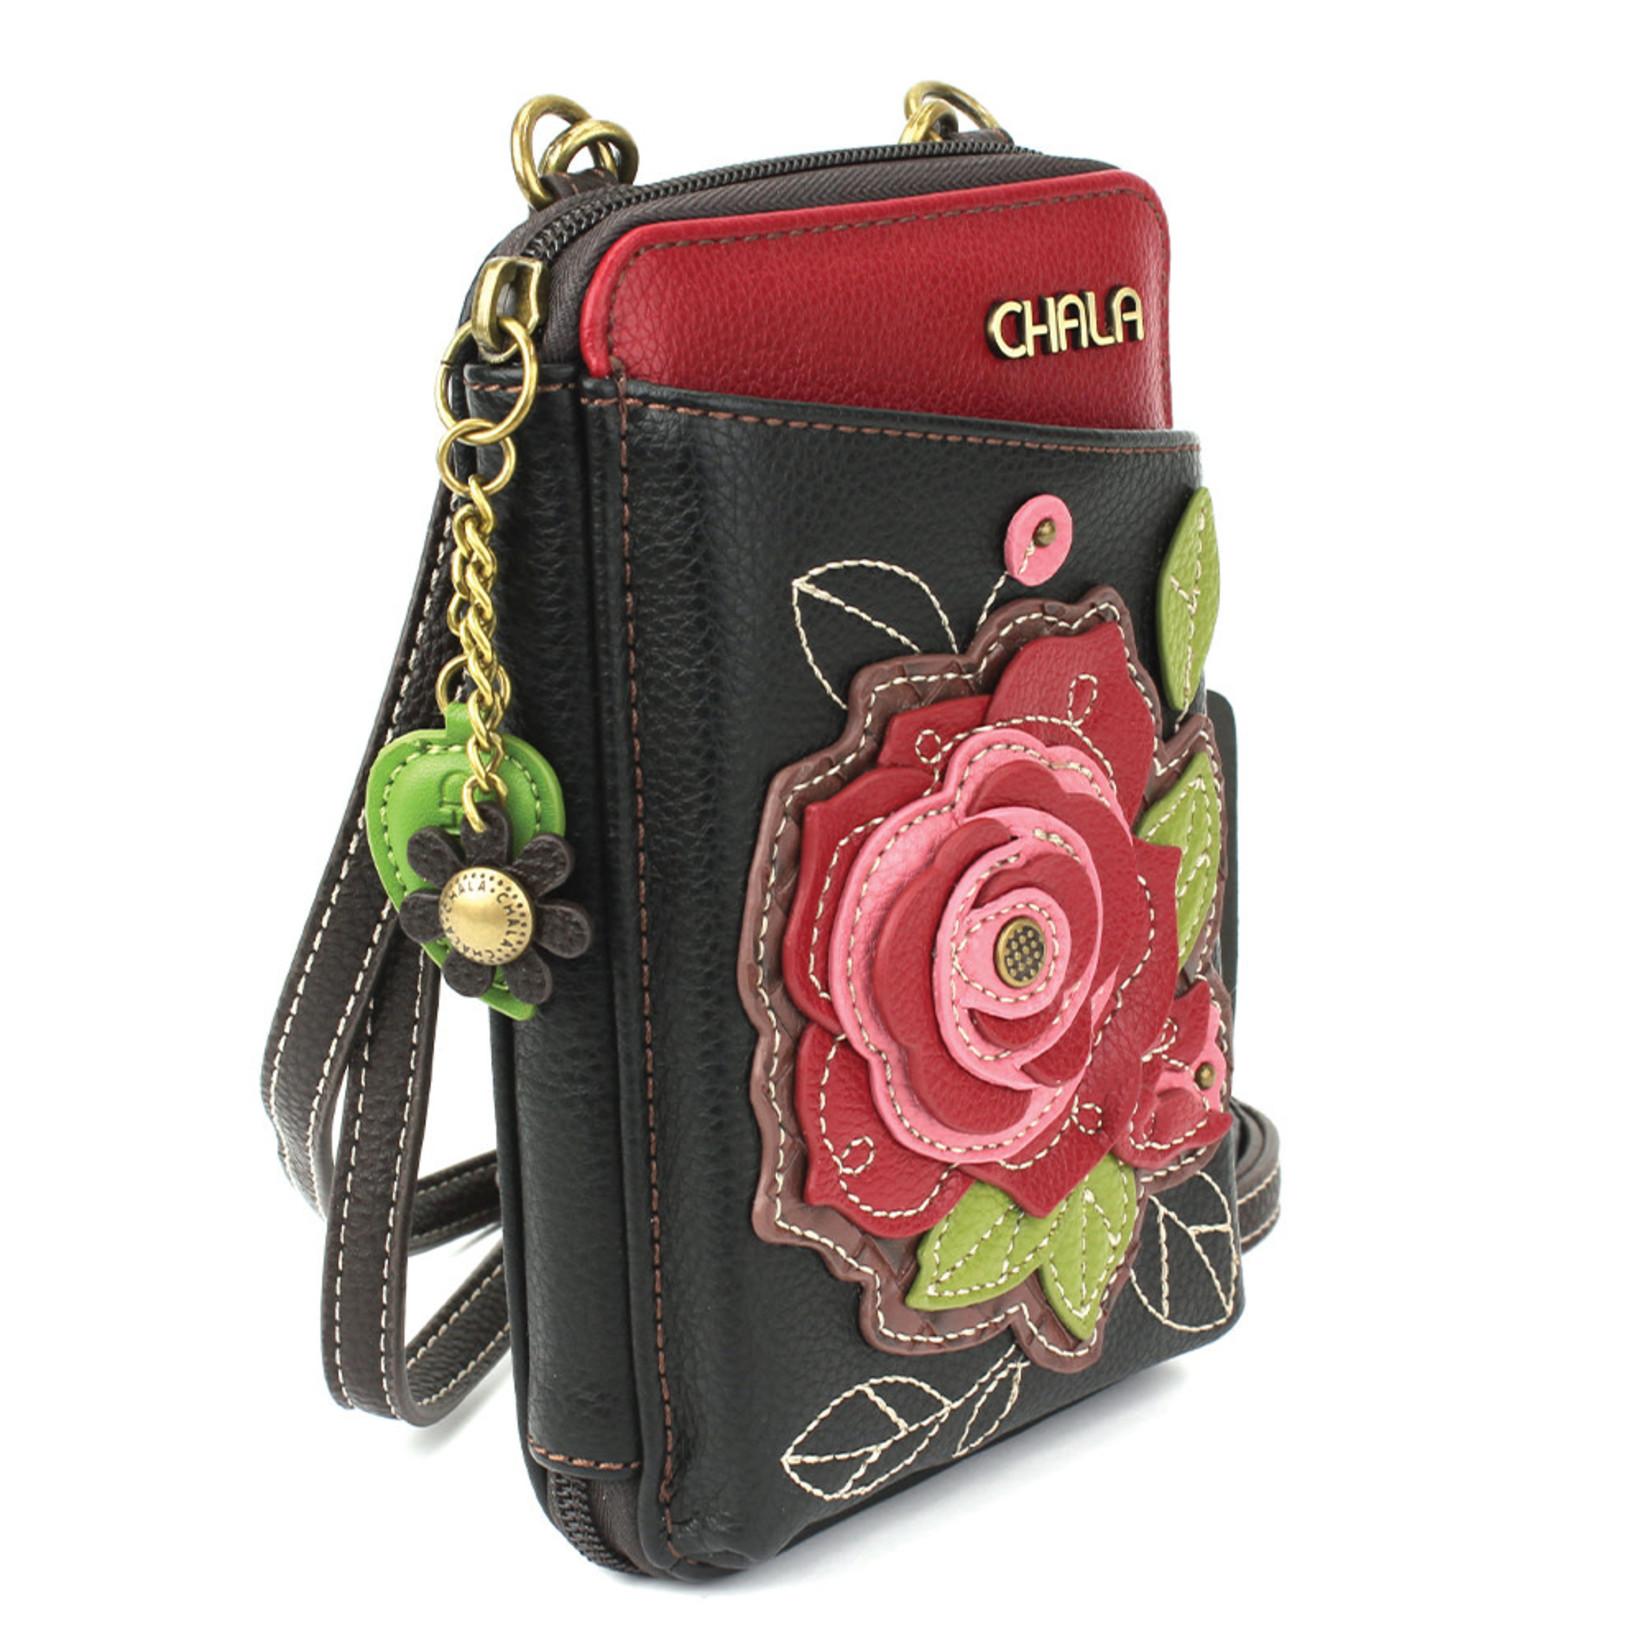 Chala Wallet Crossbody - Red Rose